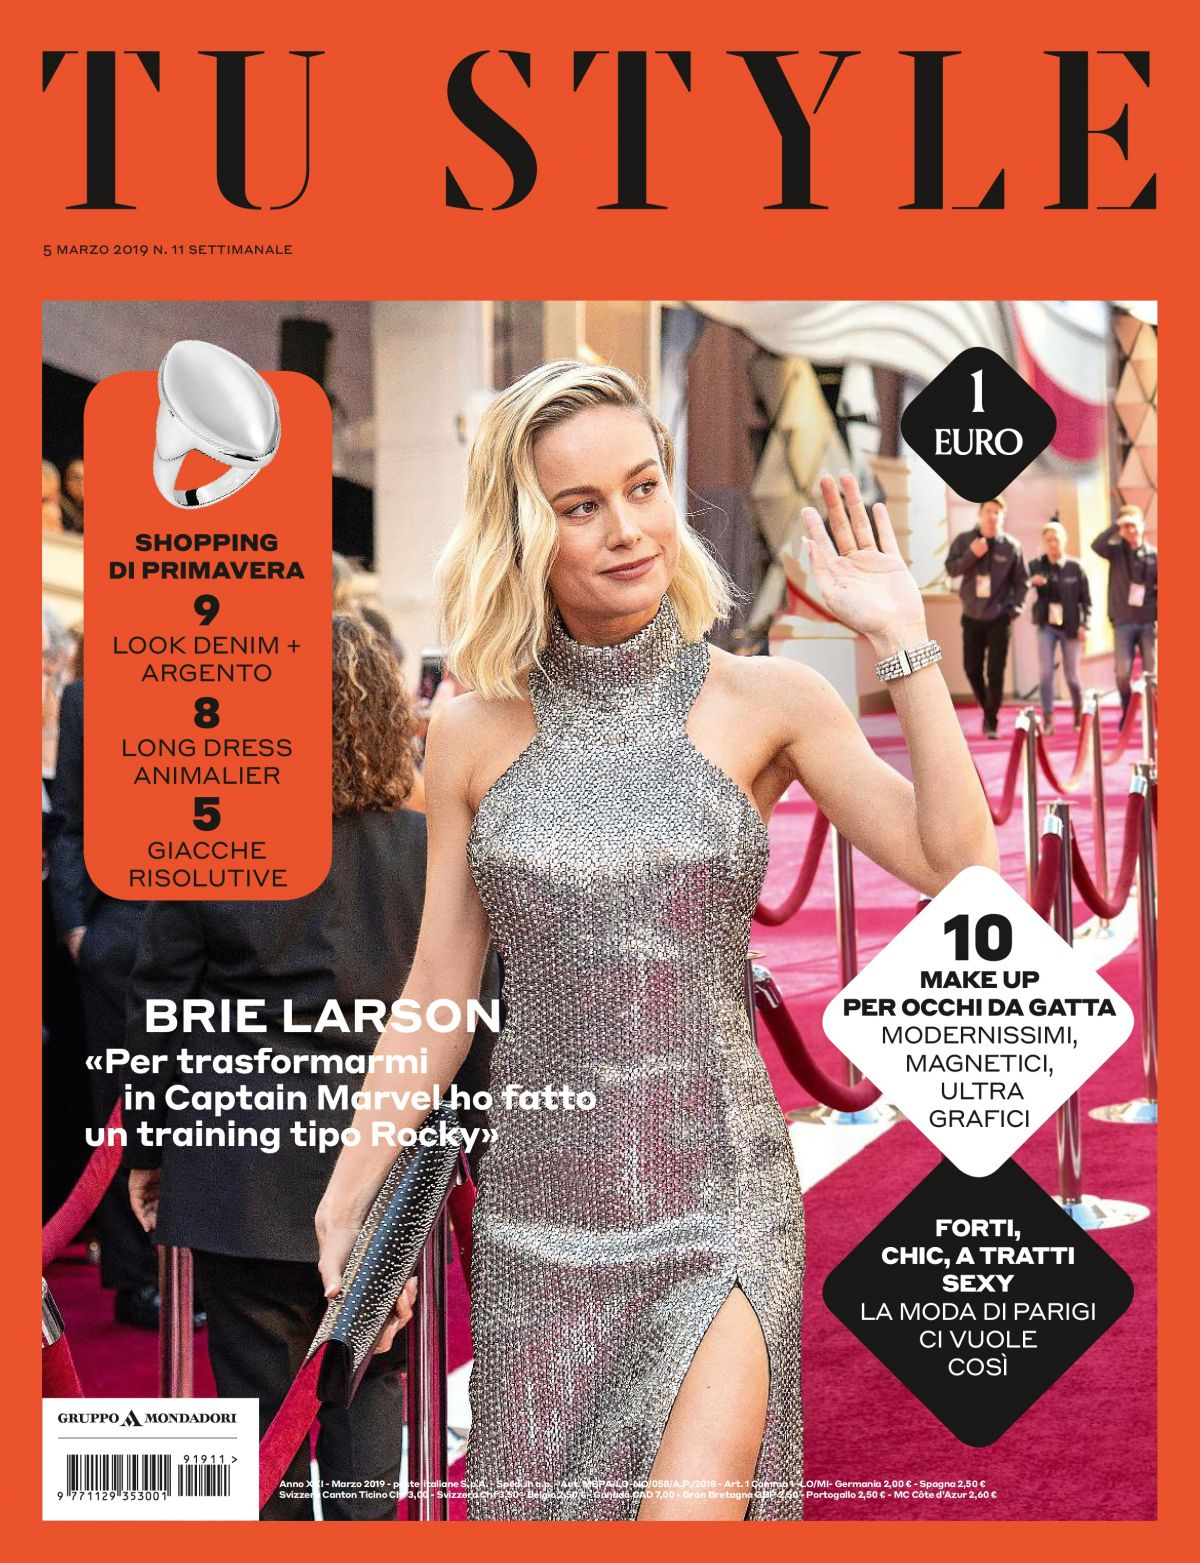 Tustyle Magazine November 2015 Issue: BRIE LARSON In Tu Style Magazine, March 2019